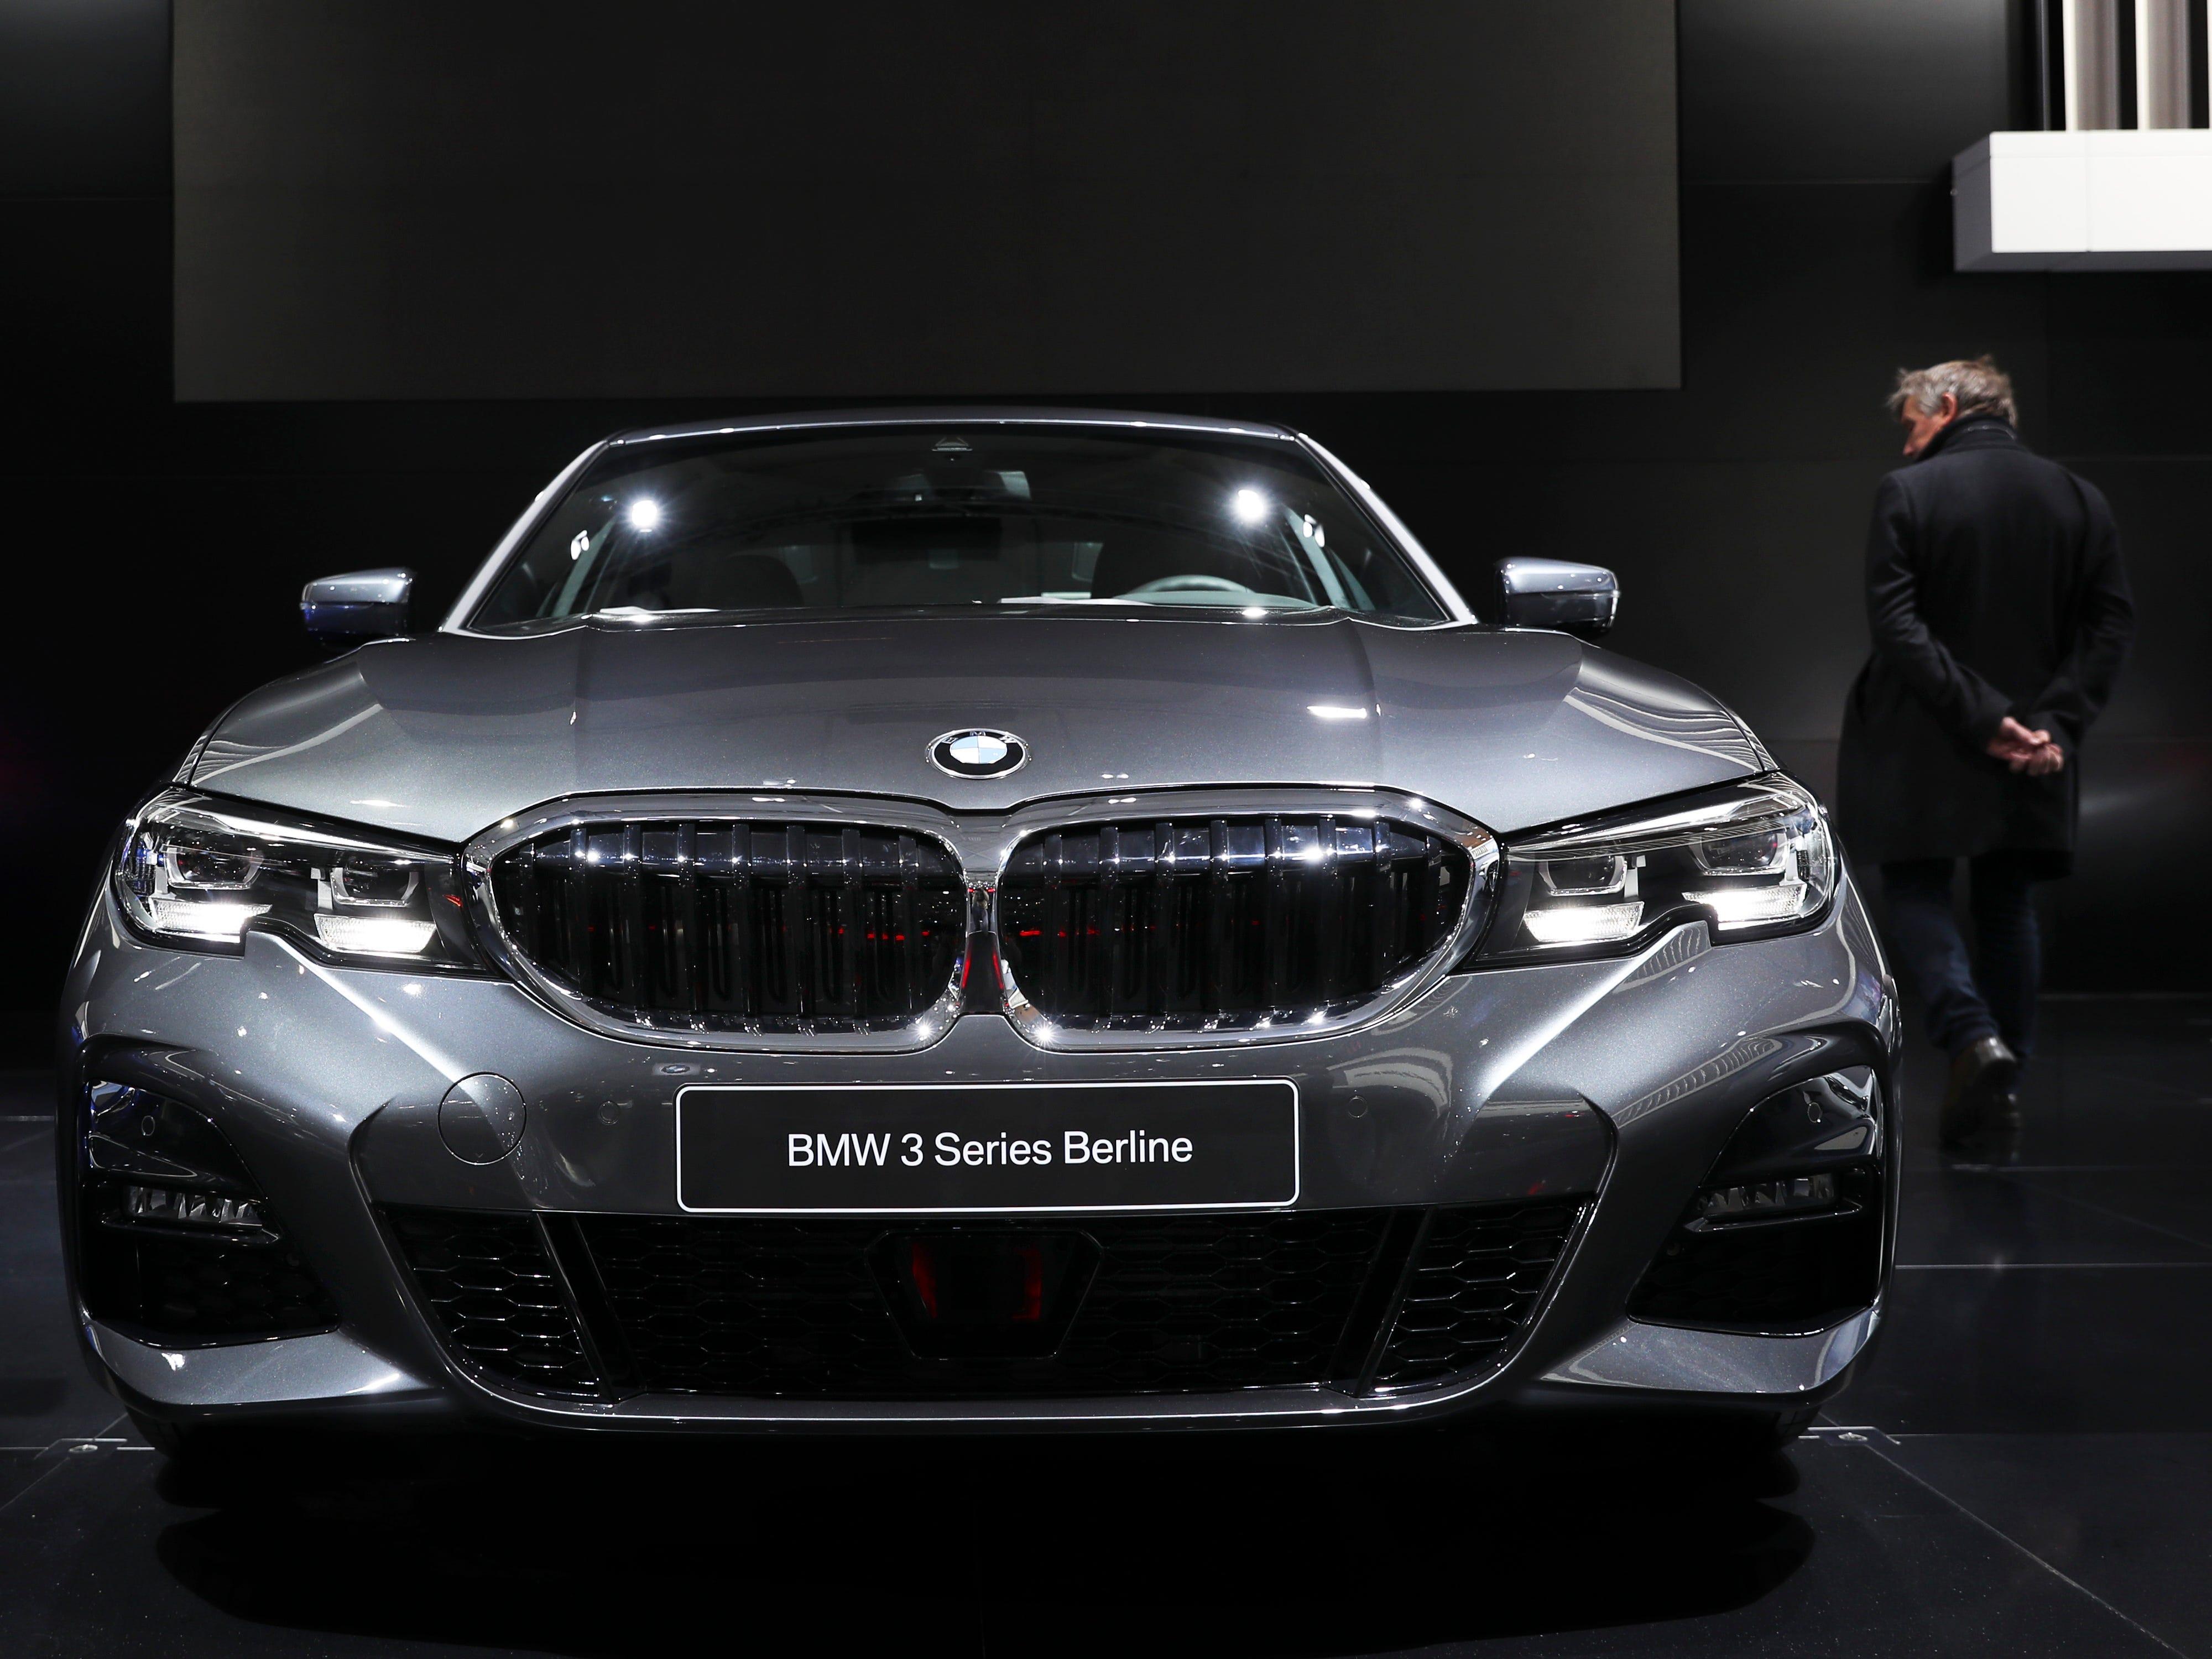 A man walks next to the new BMW 3.